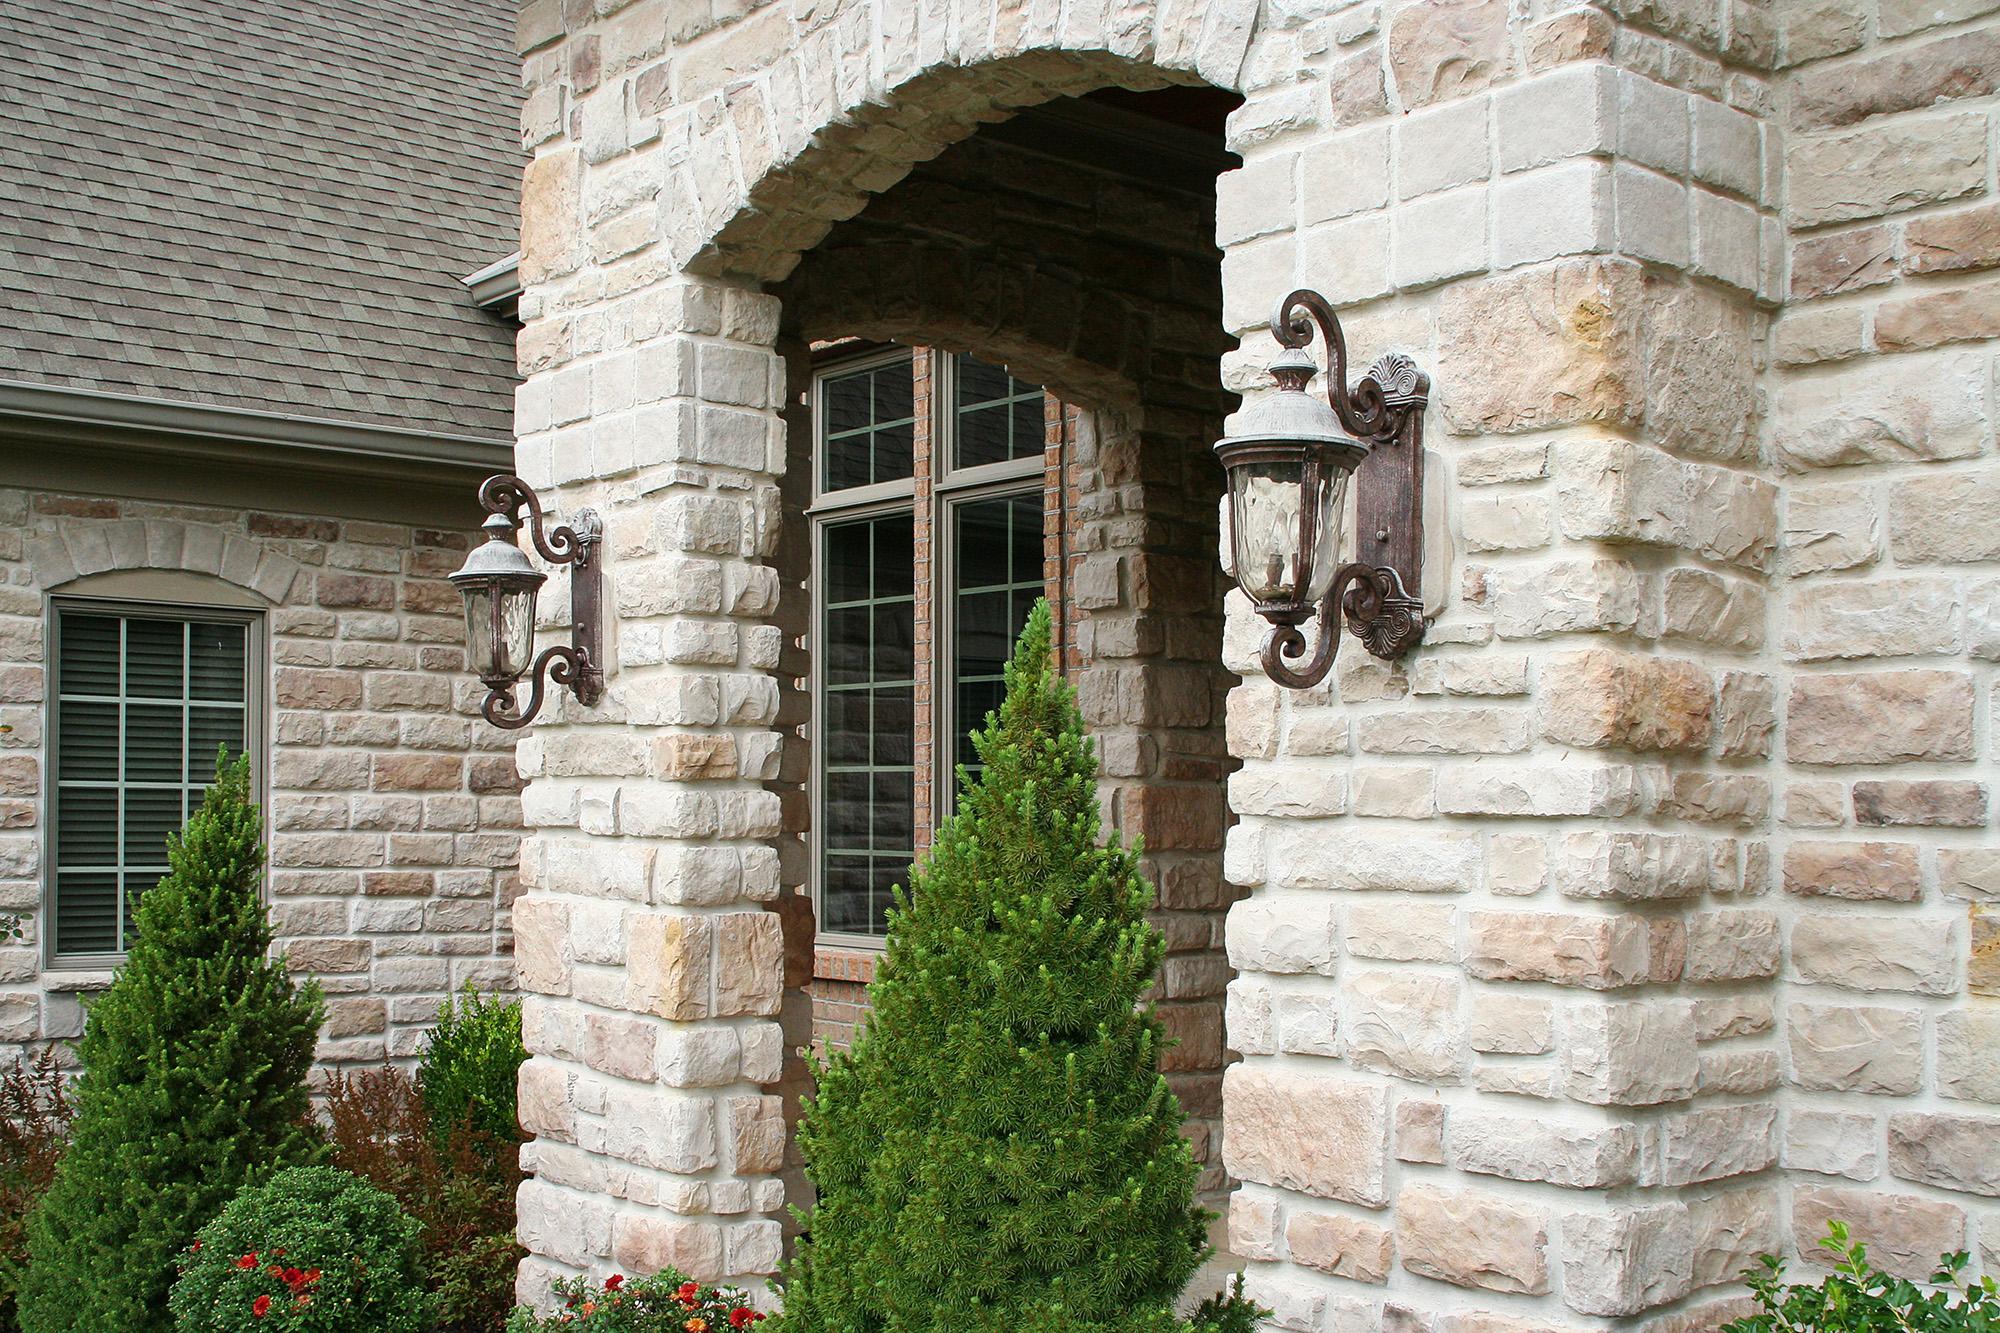 Manufactured Stone Veneer Five Tips For An Easier Installation Jlc Online